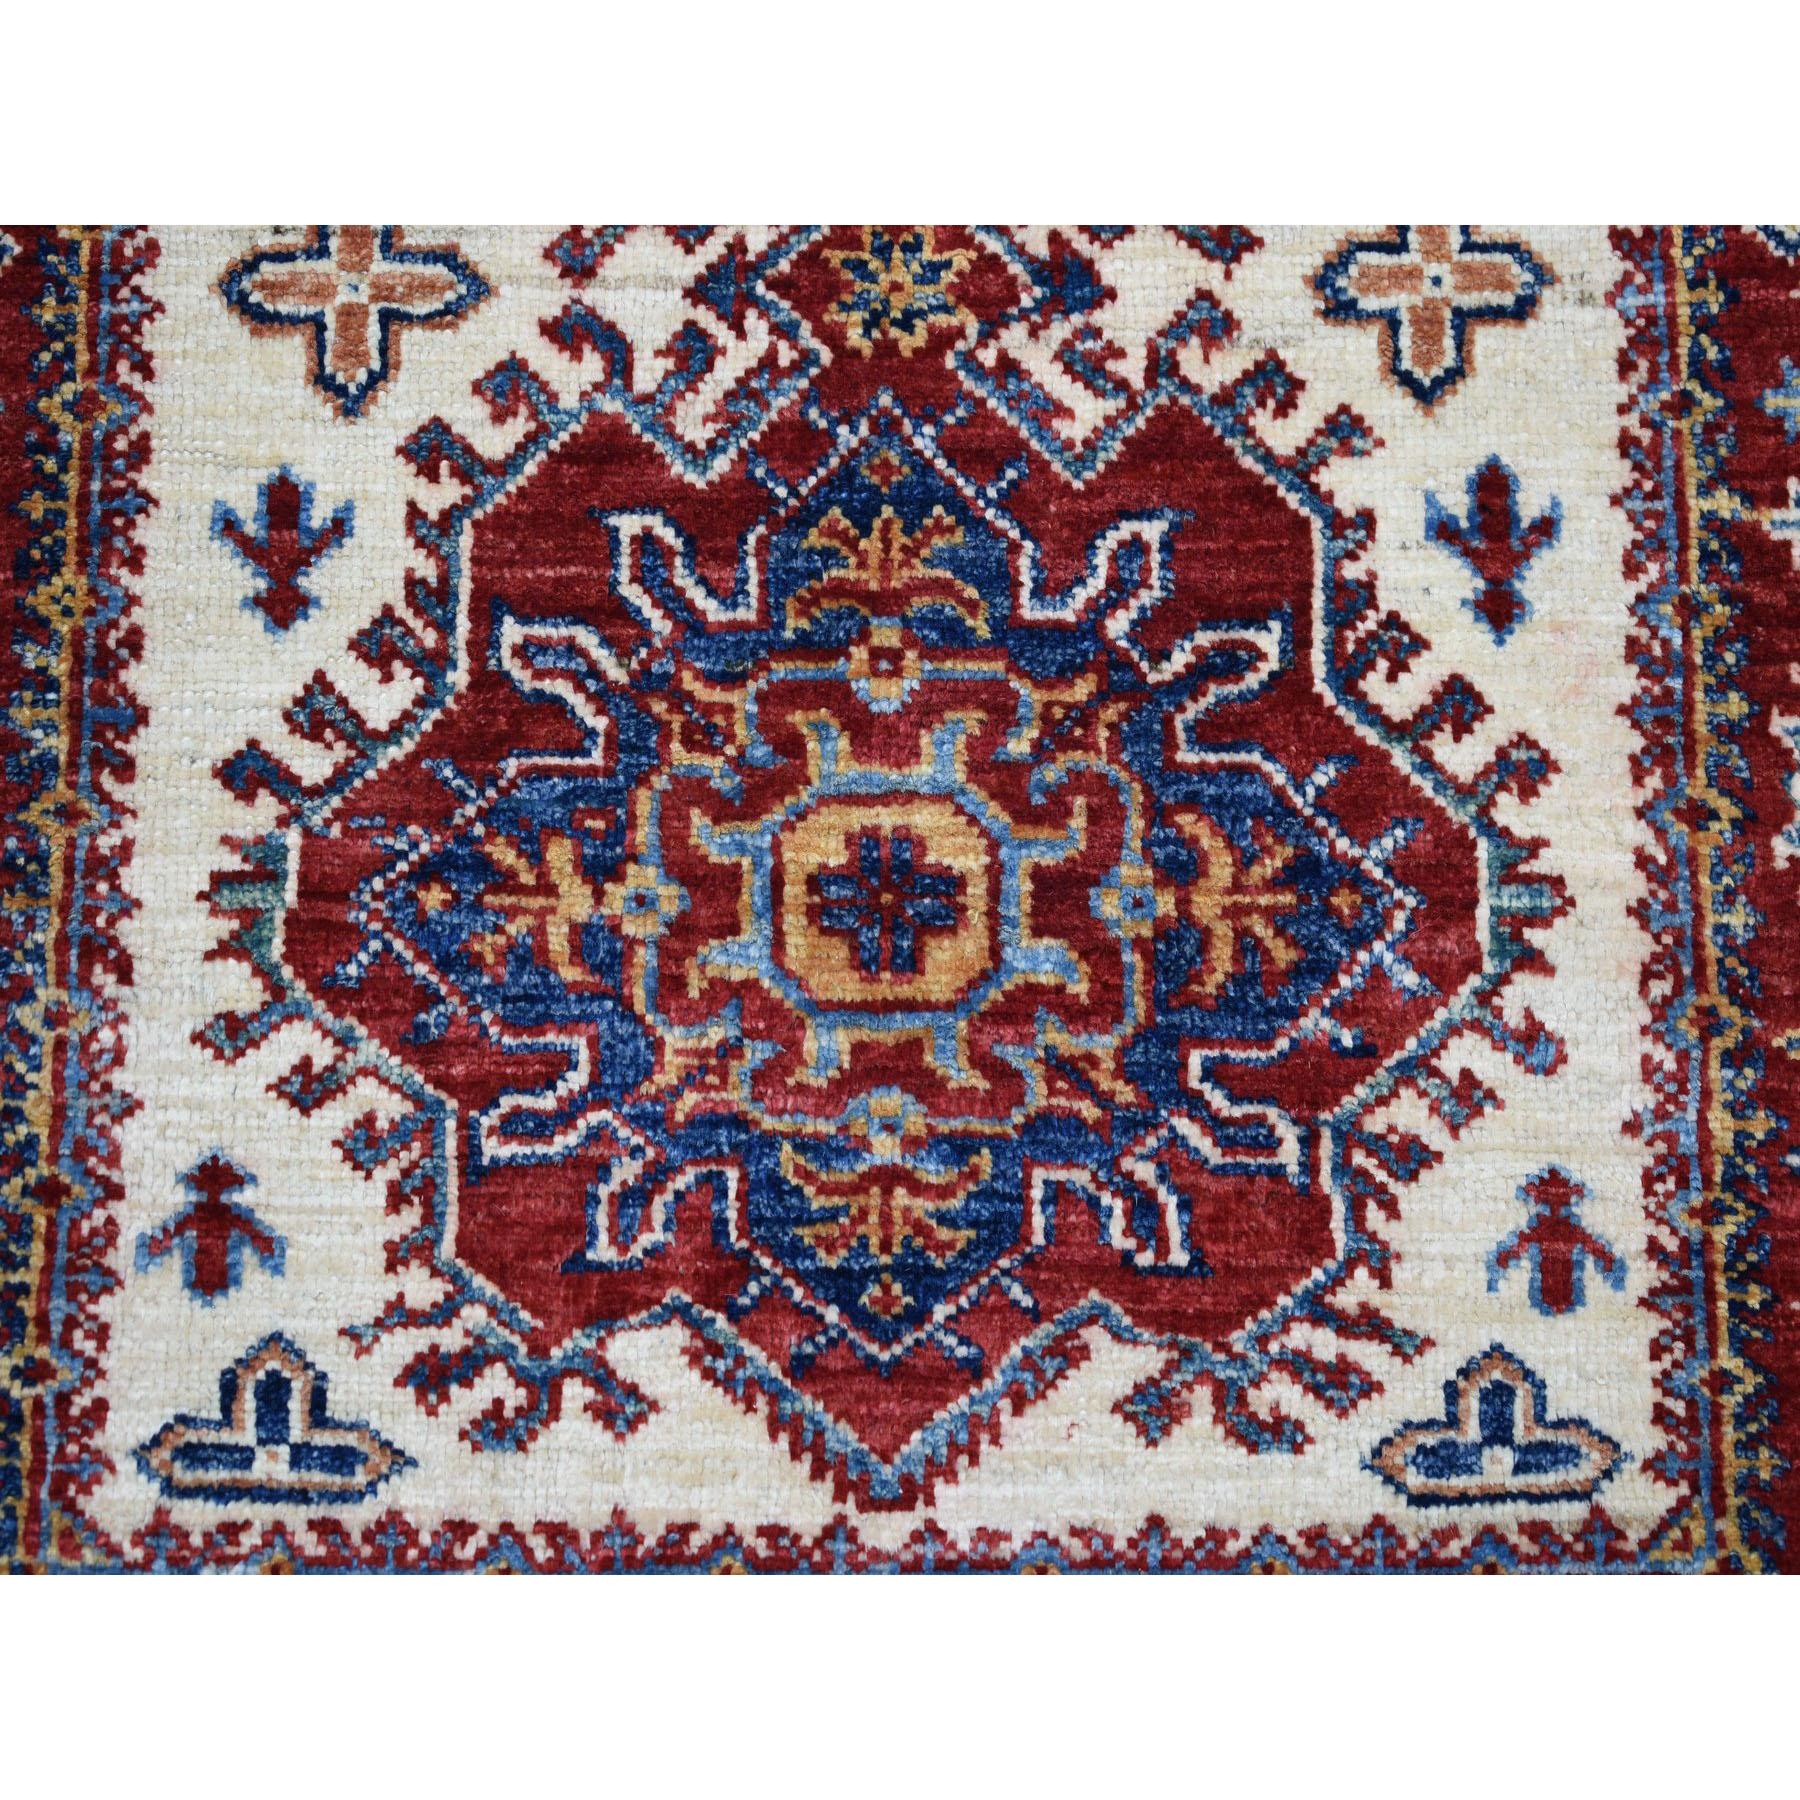 2-8 x4-7  Ivory Super Kazak Pure Wool Geometric Design Hand-Knotted Oriental Rug